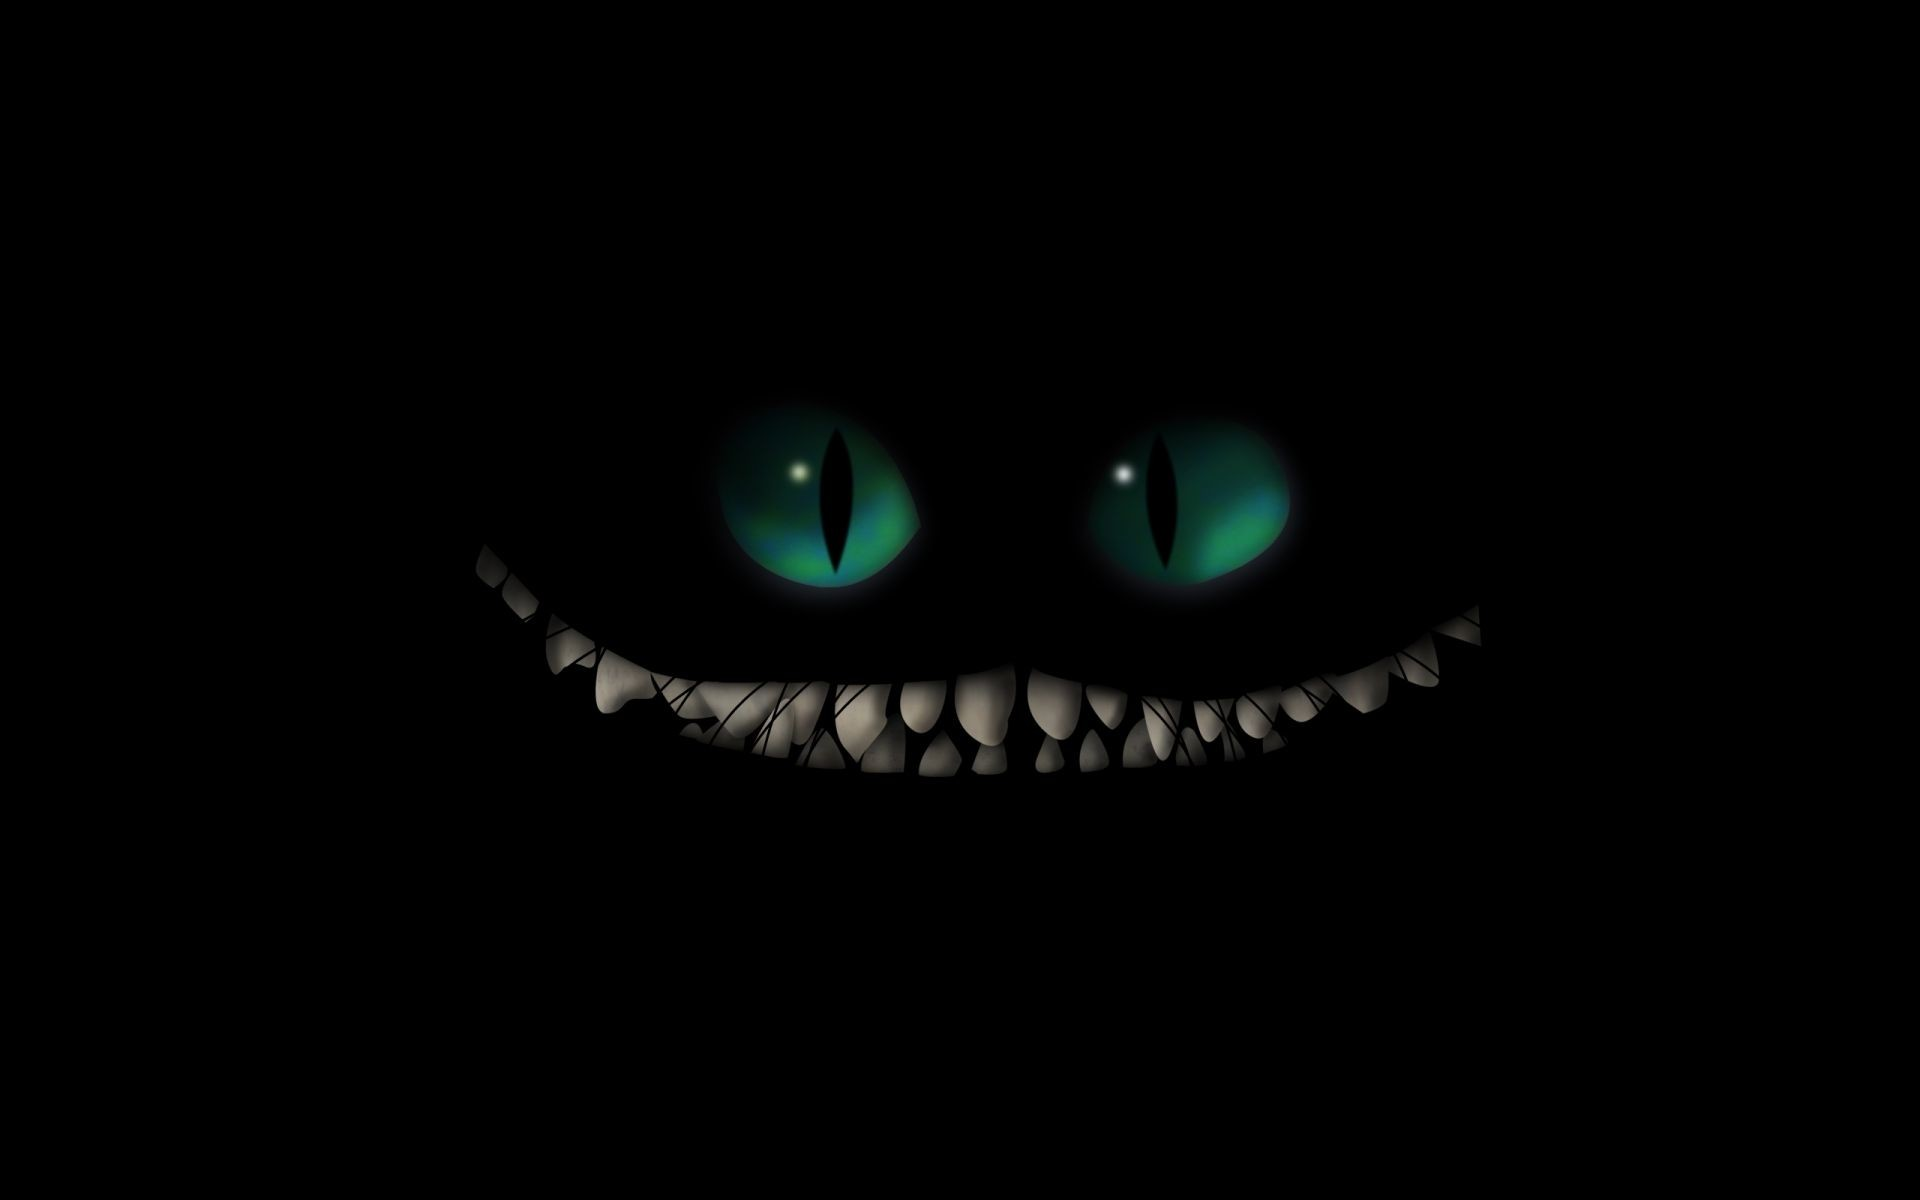 Dark monster creature fangs evil scary creepy spooky halloween .